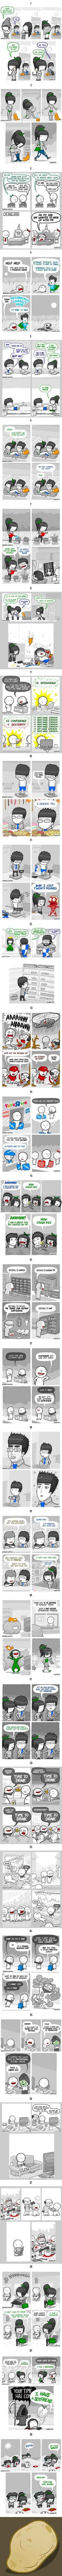 30 Comics That End Unexpectedly